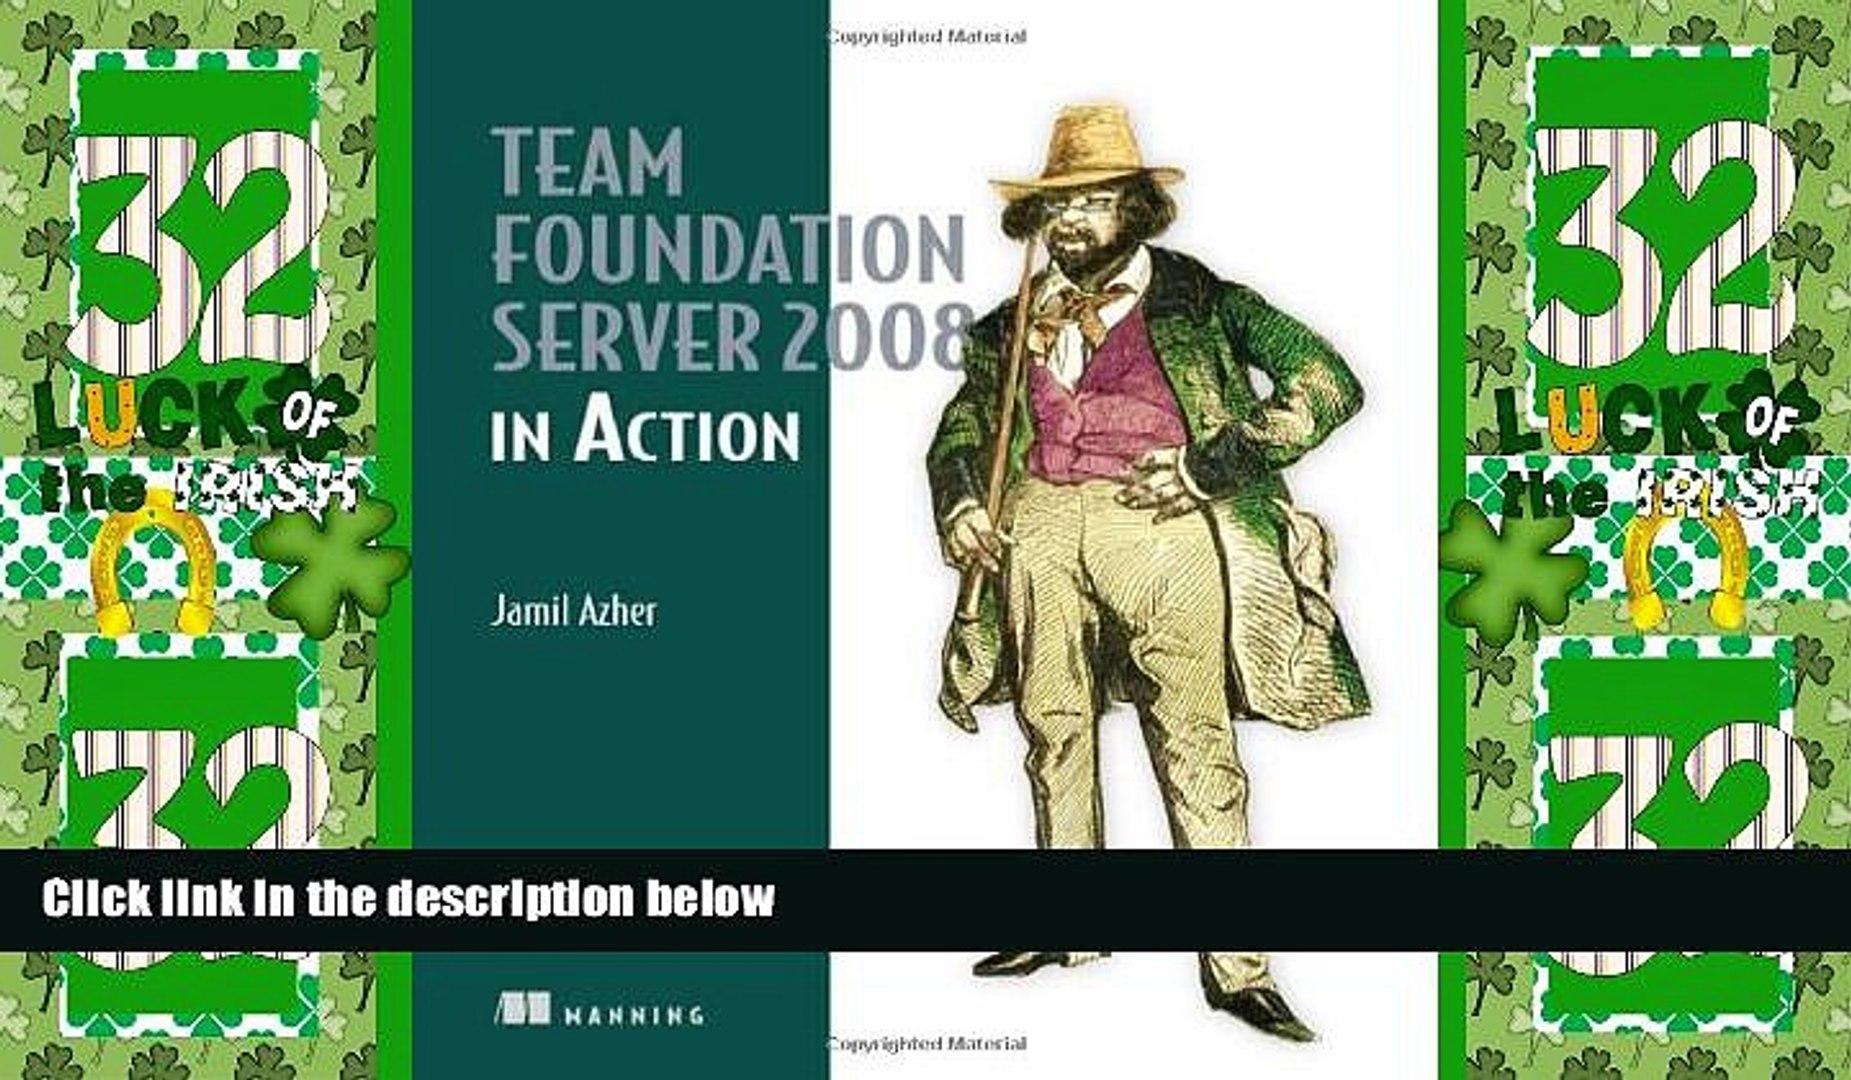 Best Price Team Foundation Server 2008 in Action Jamil Azher For Kindle